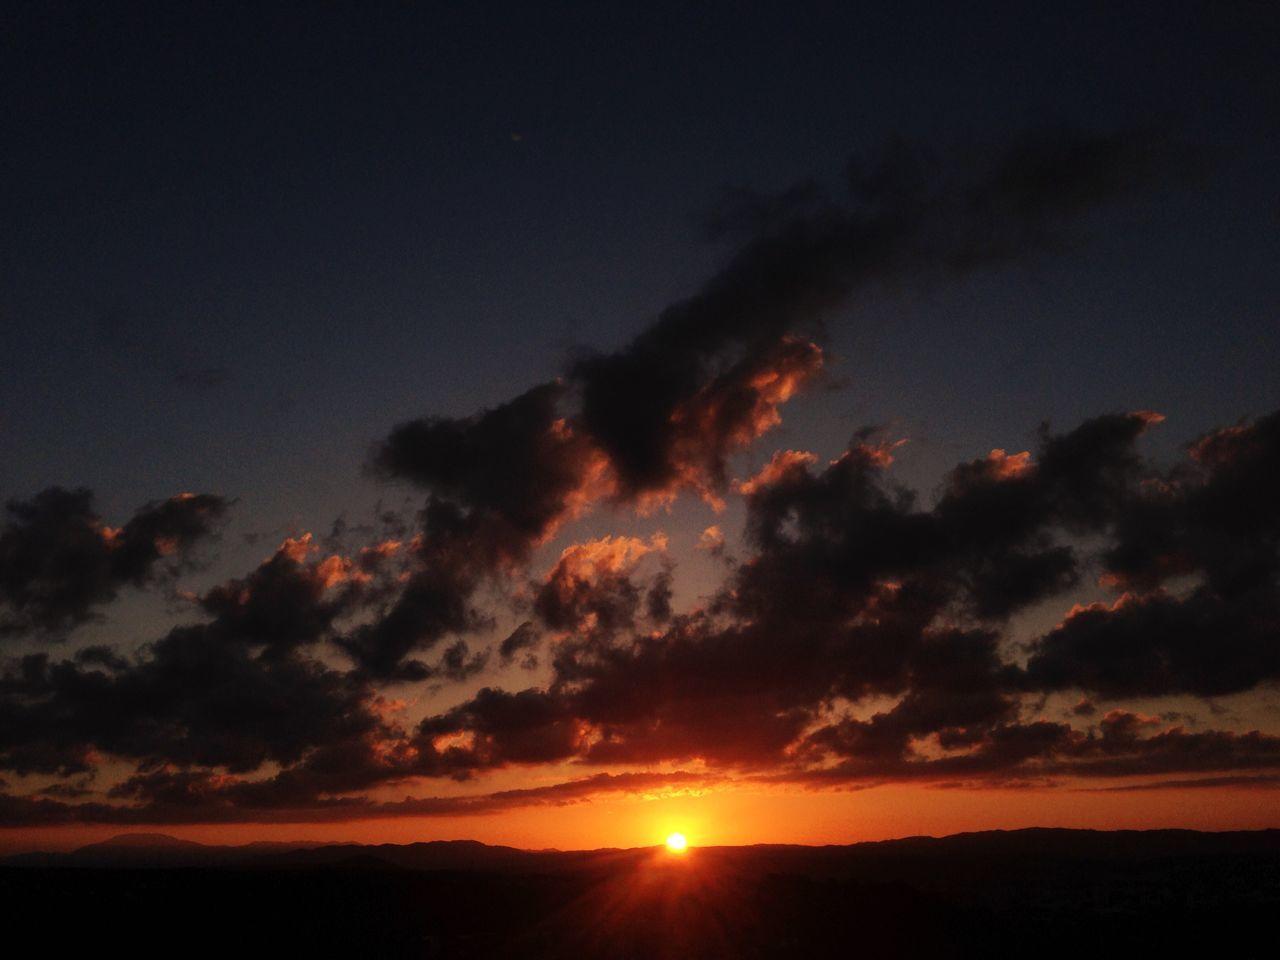 sunset, sun, silhouette, beauty in nature, nature, scenics, orange color, sky, majestic, tranquil scene, tranquility, idyllic, no people, outdoors, cloud - sky, landscape